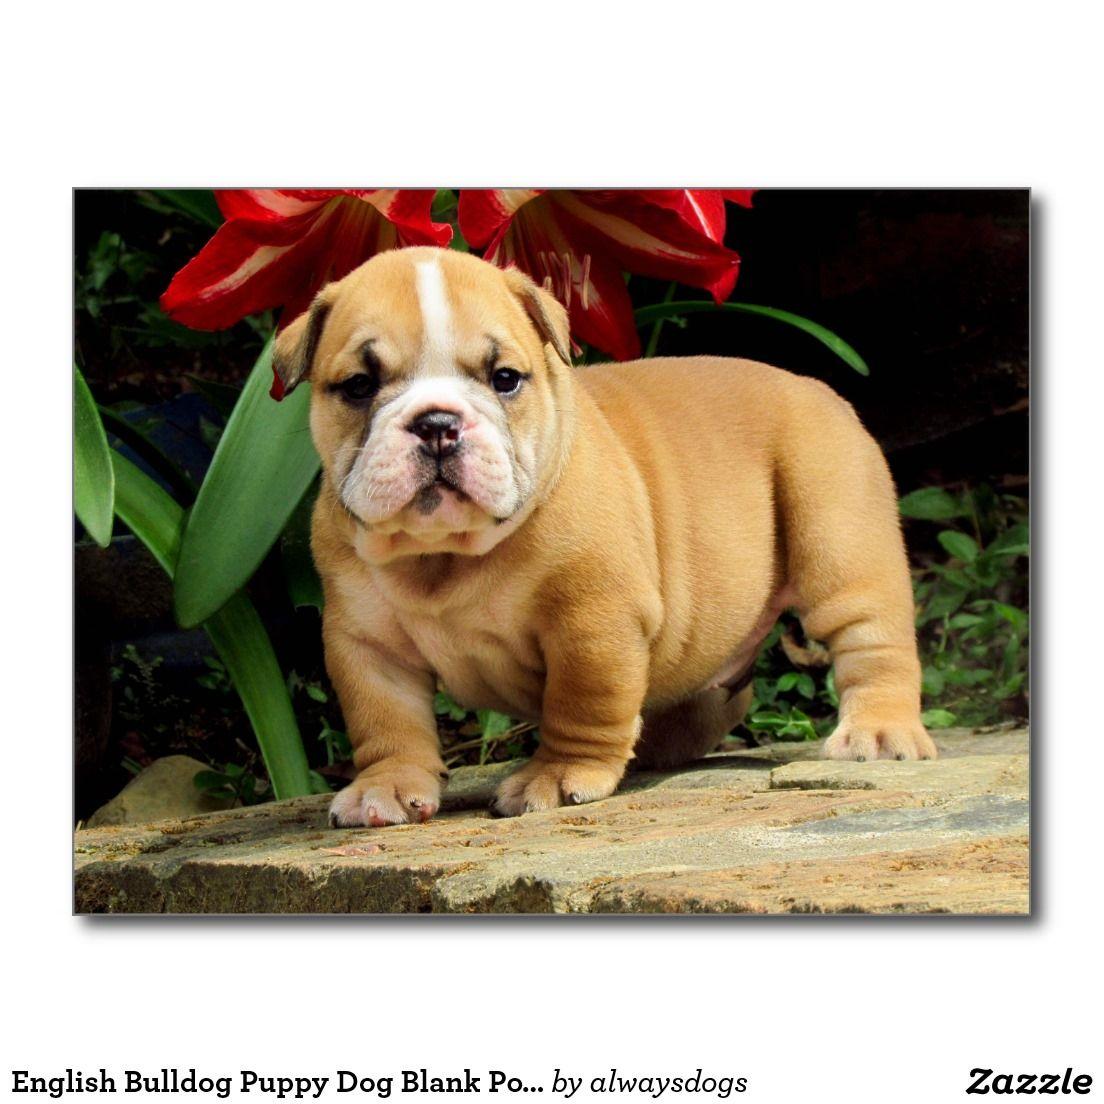 English Bulldog Puppy Dog Blank Postcard Zazzle Com English Bulldog Puppies Bulldog Puppies English Bulldog Puppy